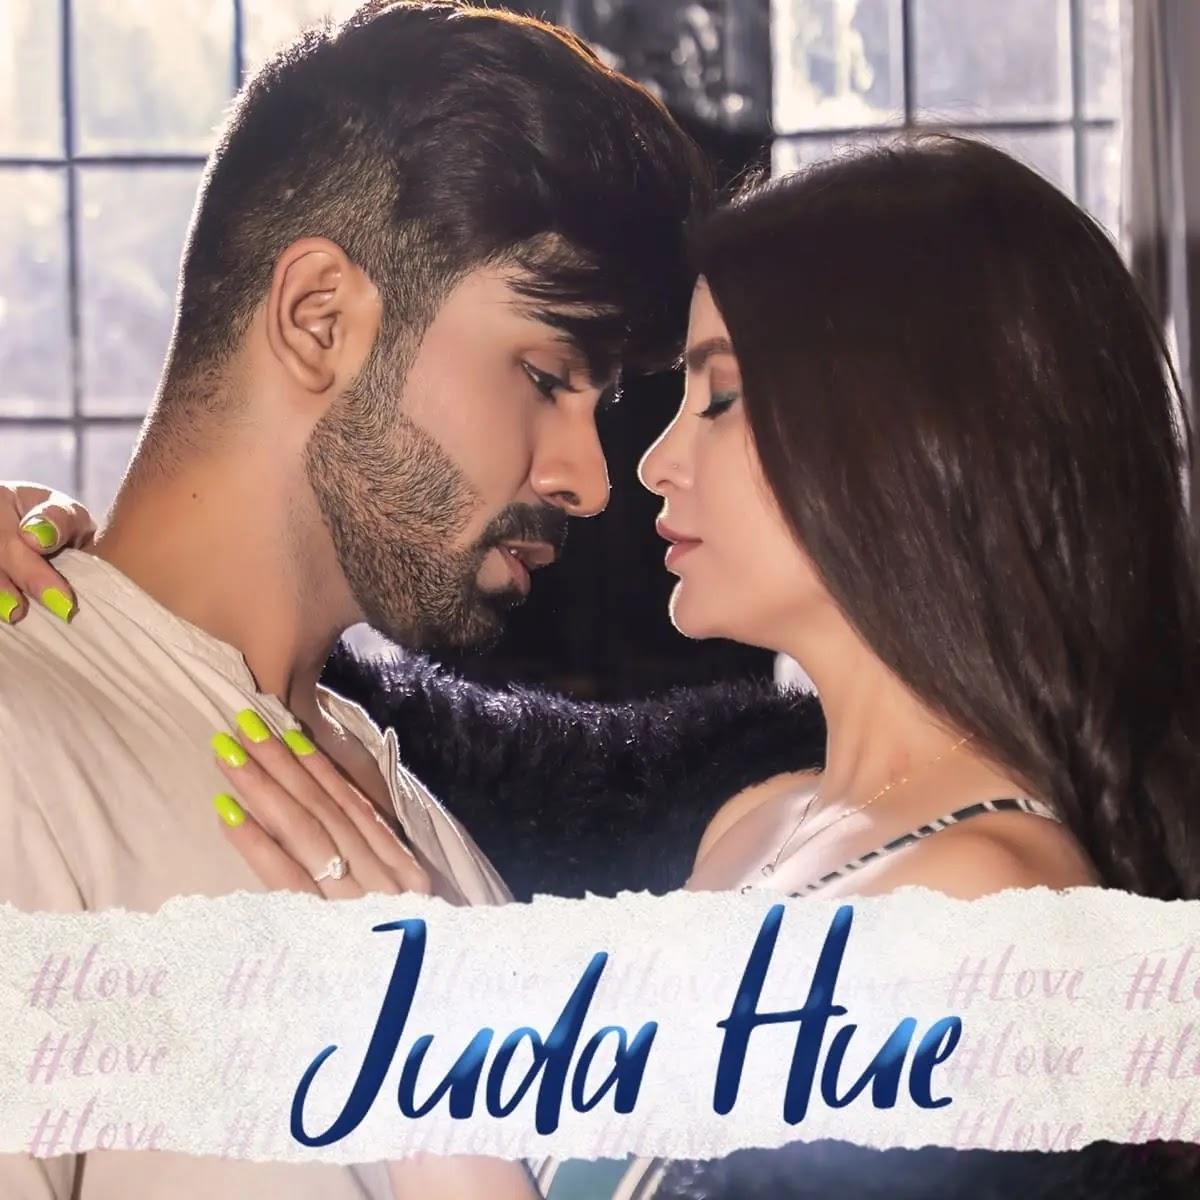 Juda Hue Jubin Shah Song Download Mp3 320kbps